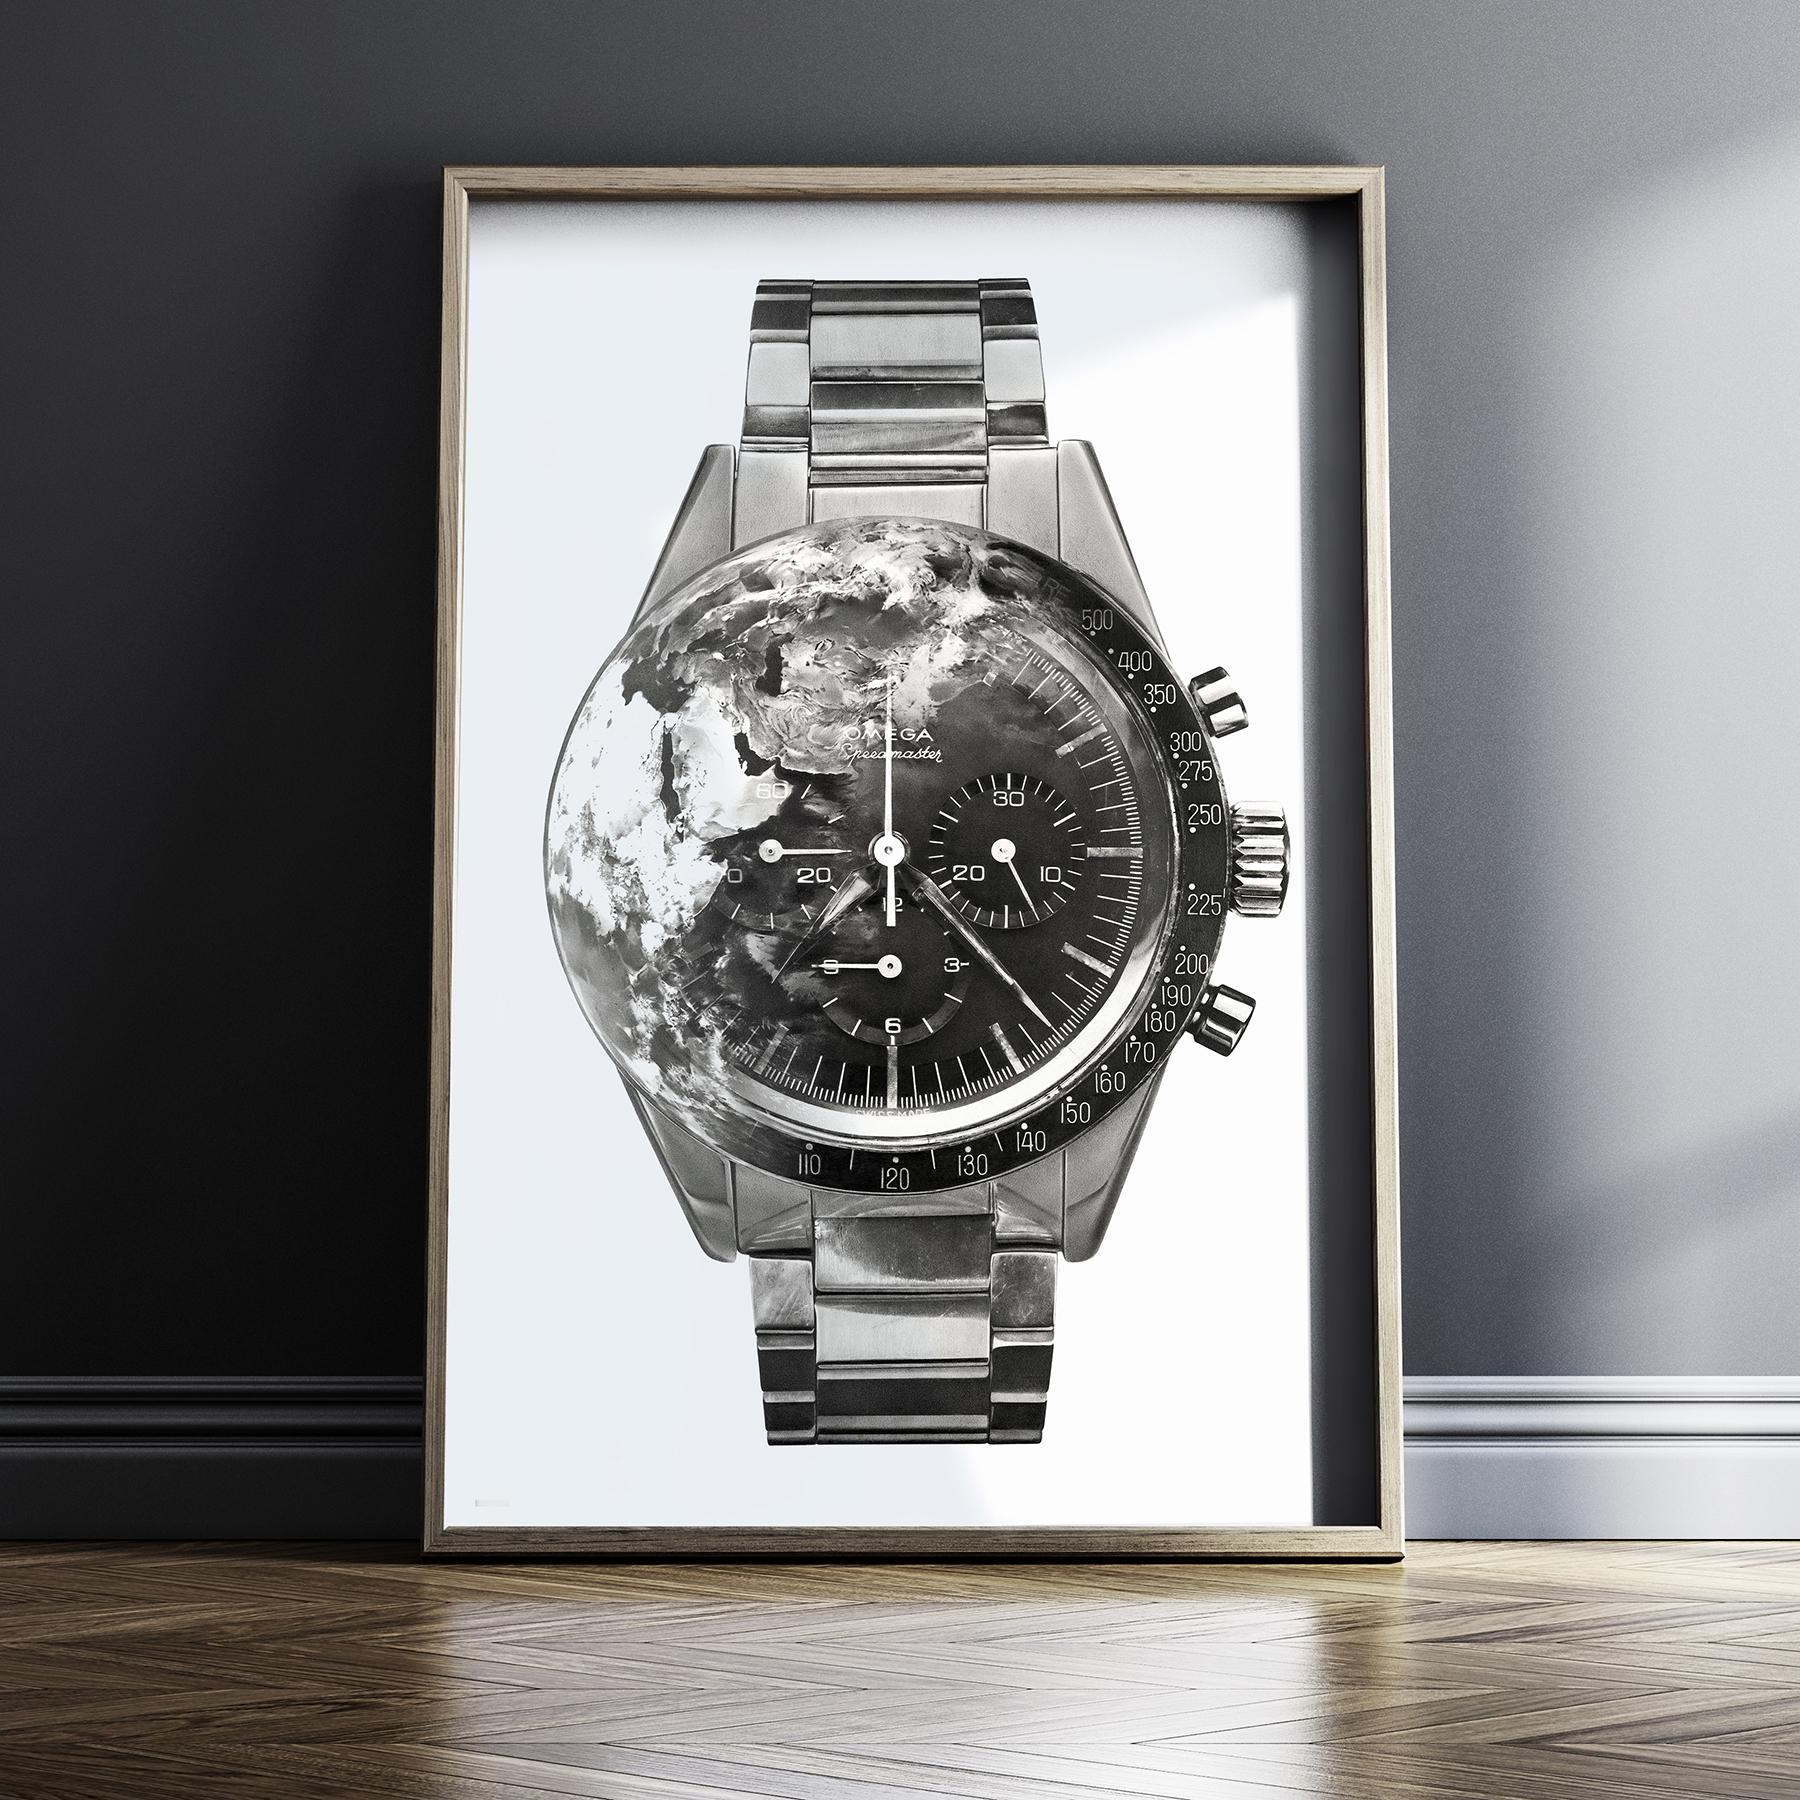 JulieKraulis-HorologicalArt-OmegaSpeedmasterCK2998-Print-Framed